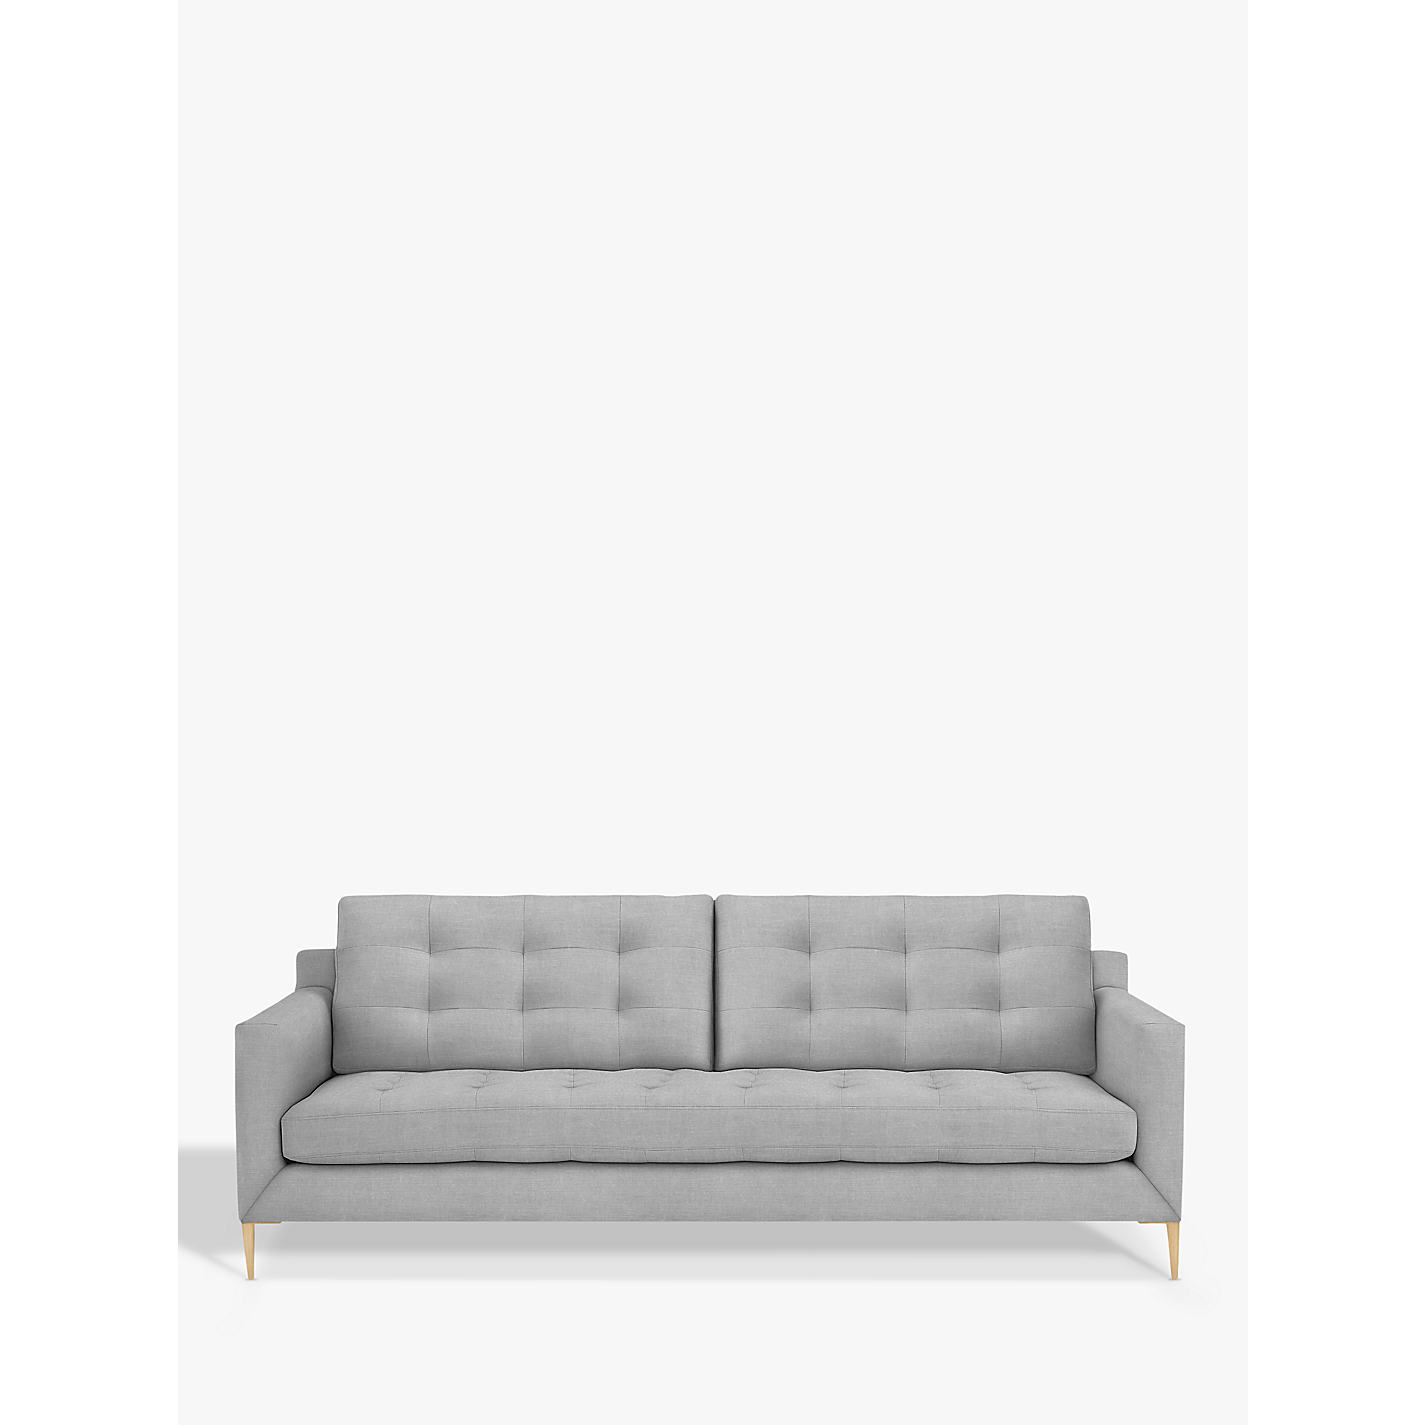 Buy John Lewis Draper 3 Seater Sofa Dark Leg Chloe Emerald